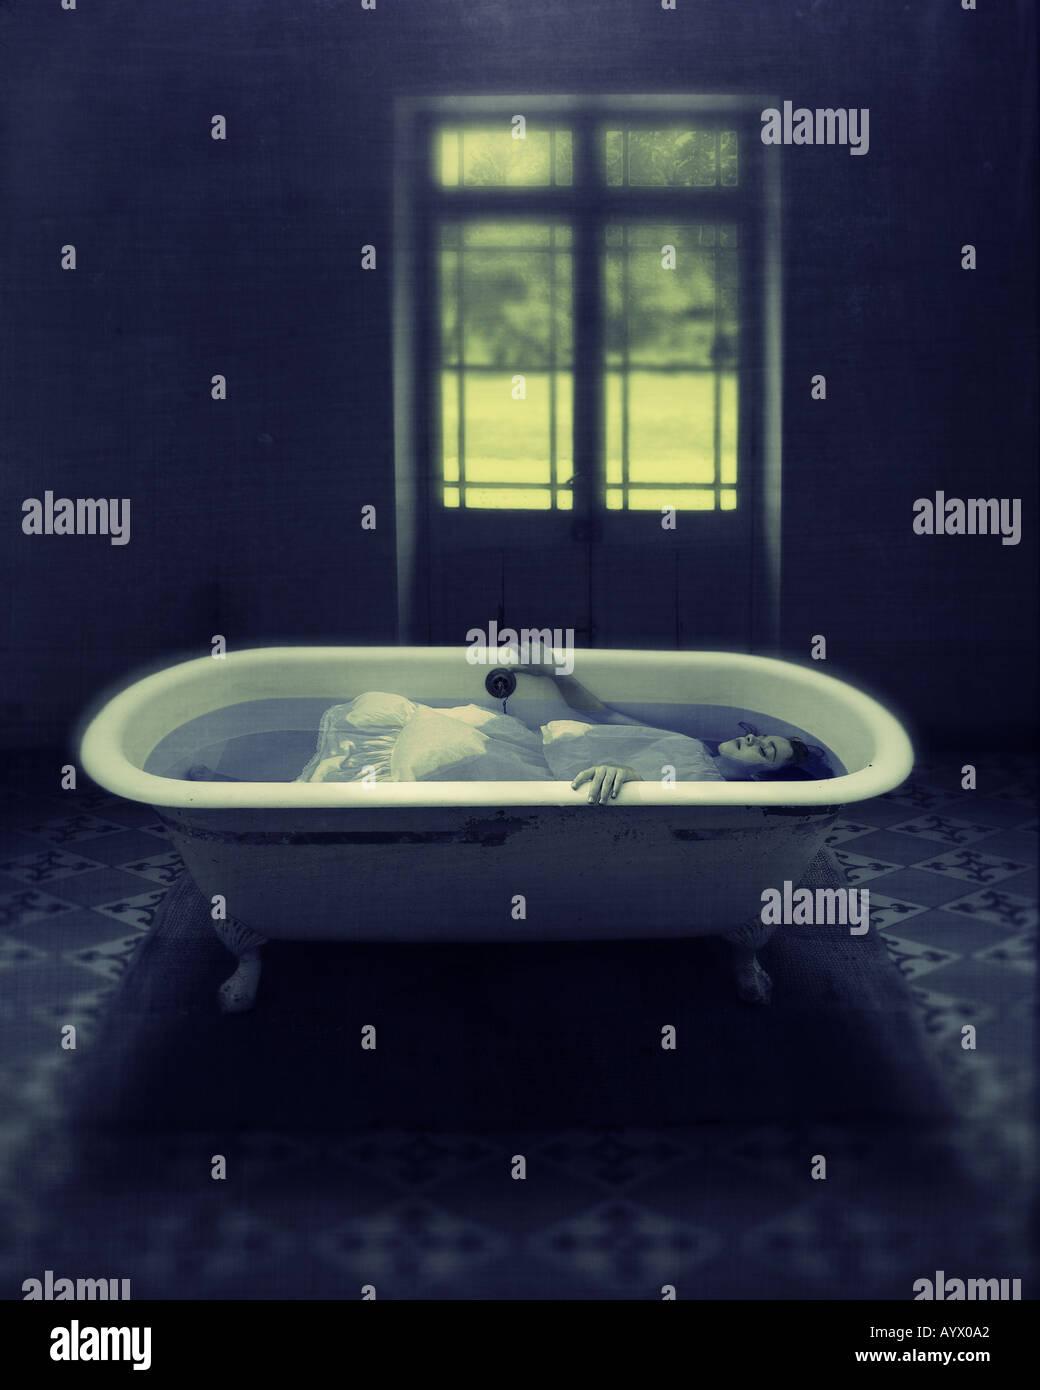 girl in white dress immersed in water in bathtub in empty room with door to garden - Stock Image